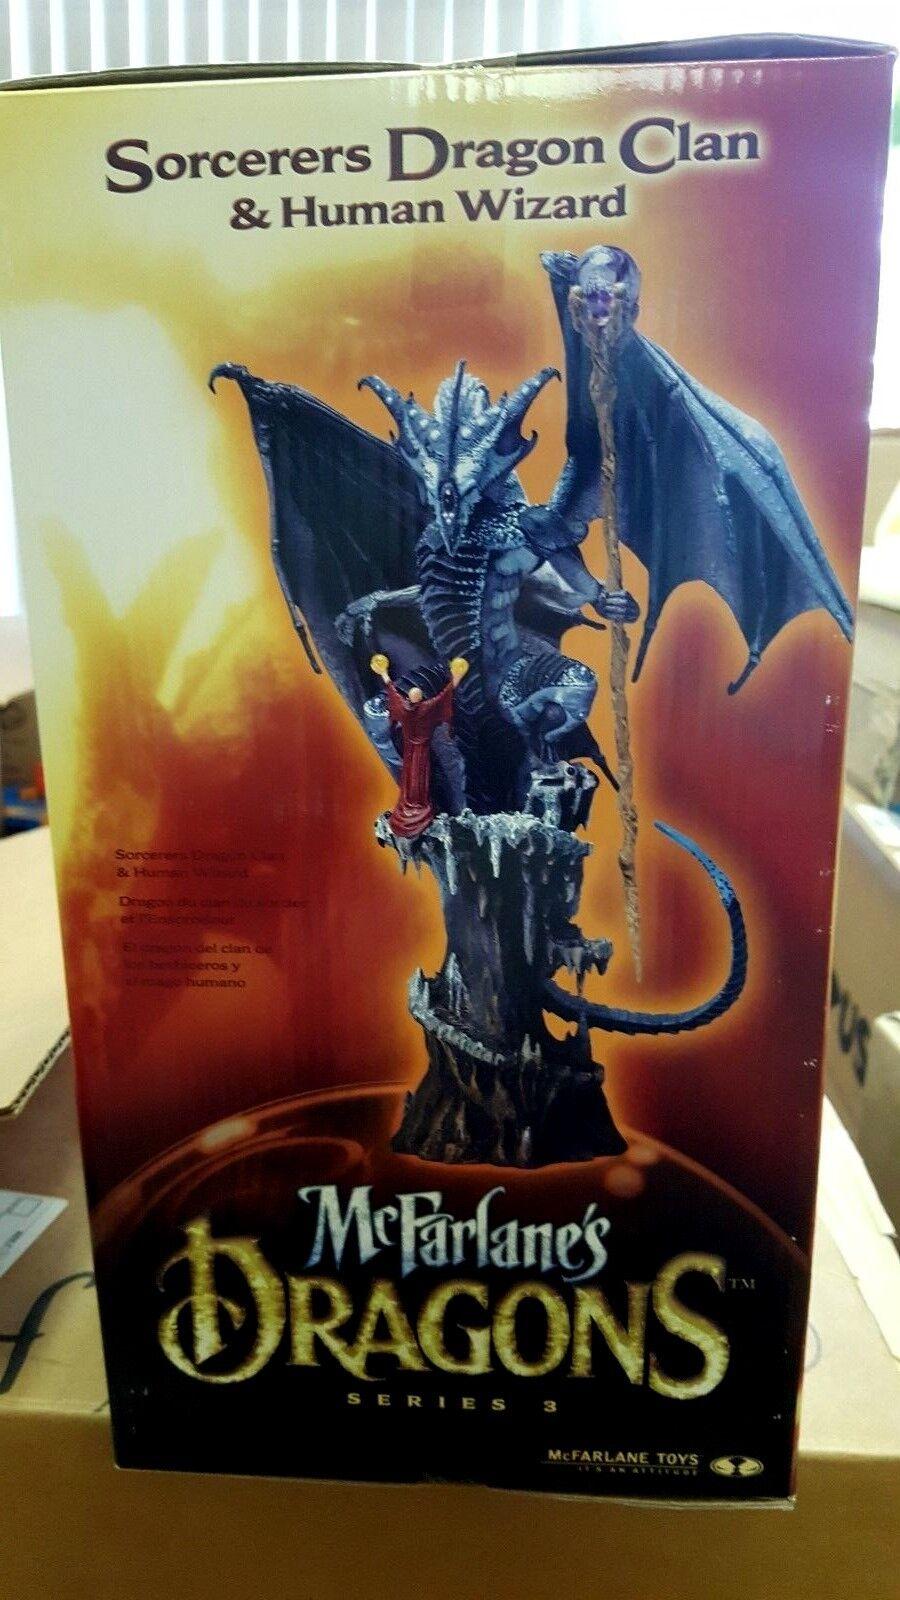 Dragons by McFarlane - Set of 6